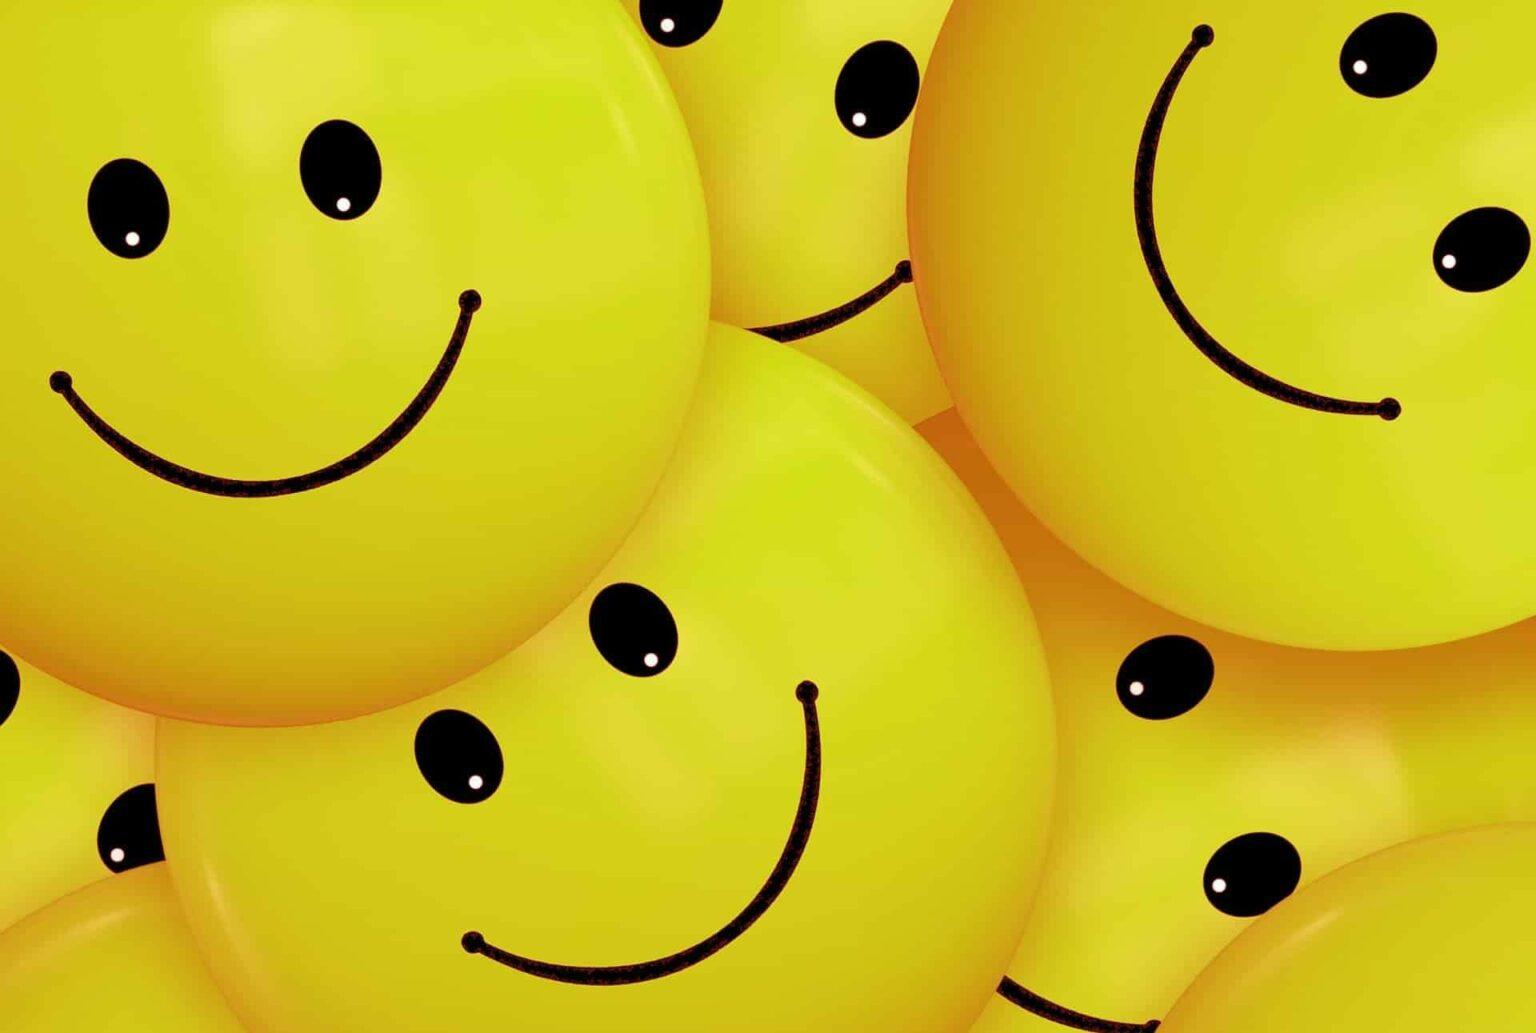 plein de smileys jaunes qui sourient